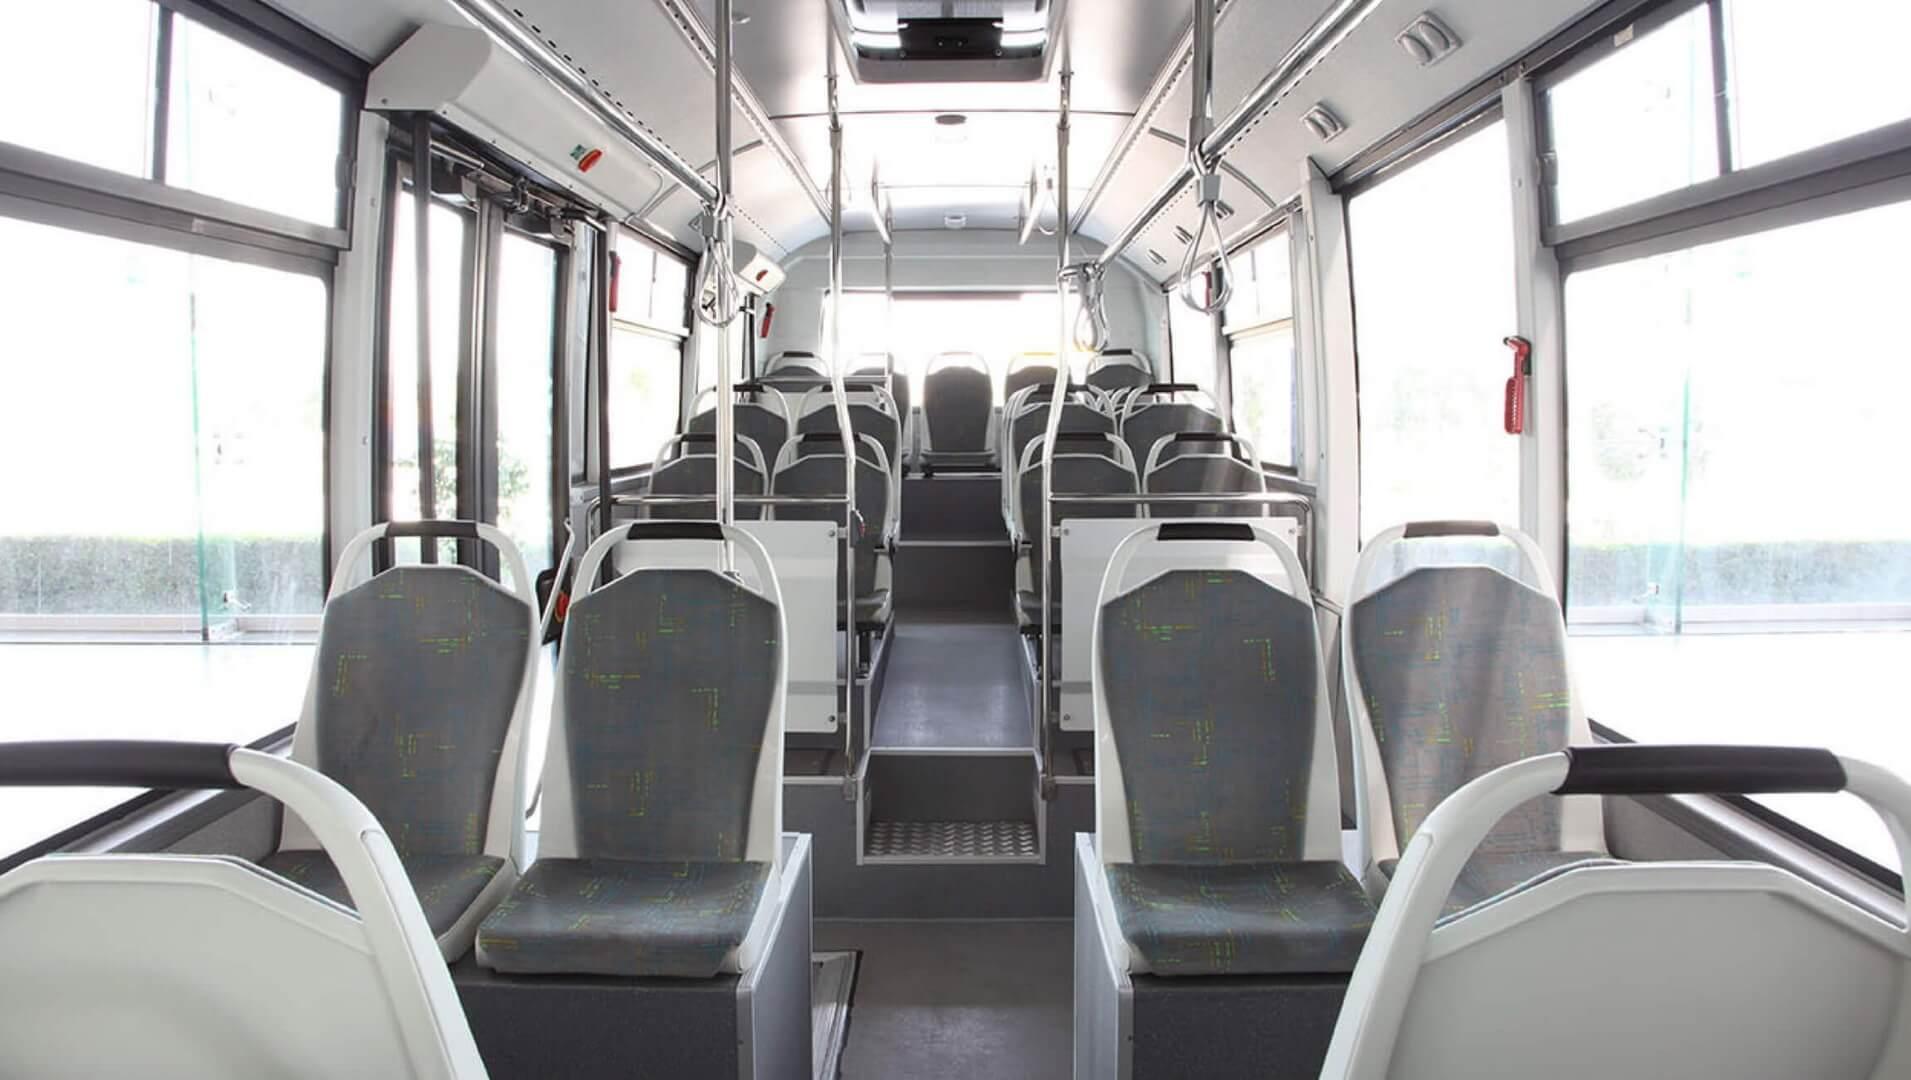 Салон электрического автобуса MD9 electriCITY